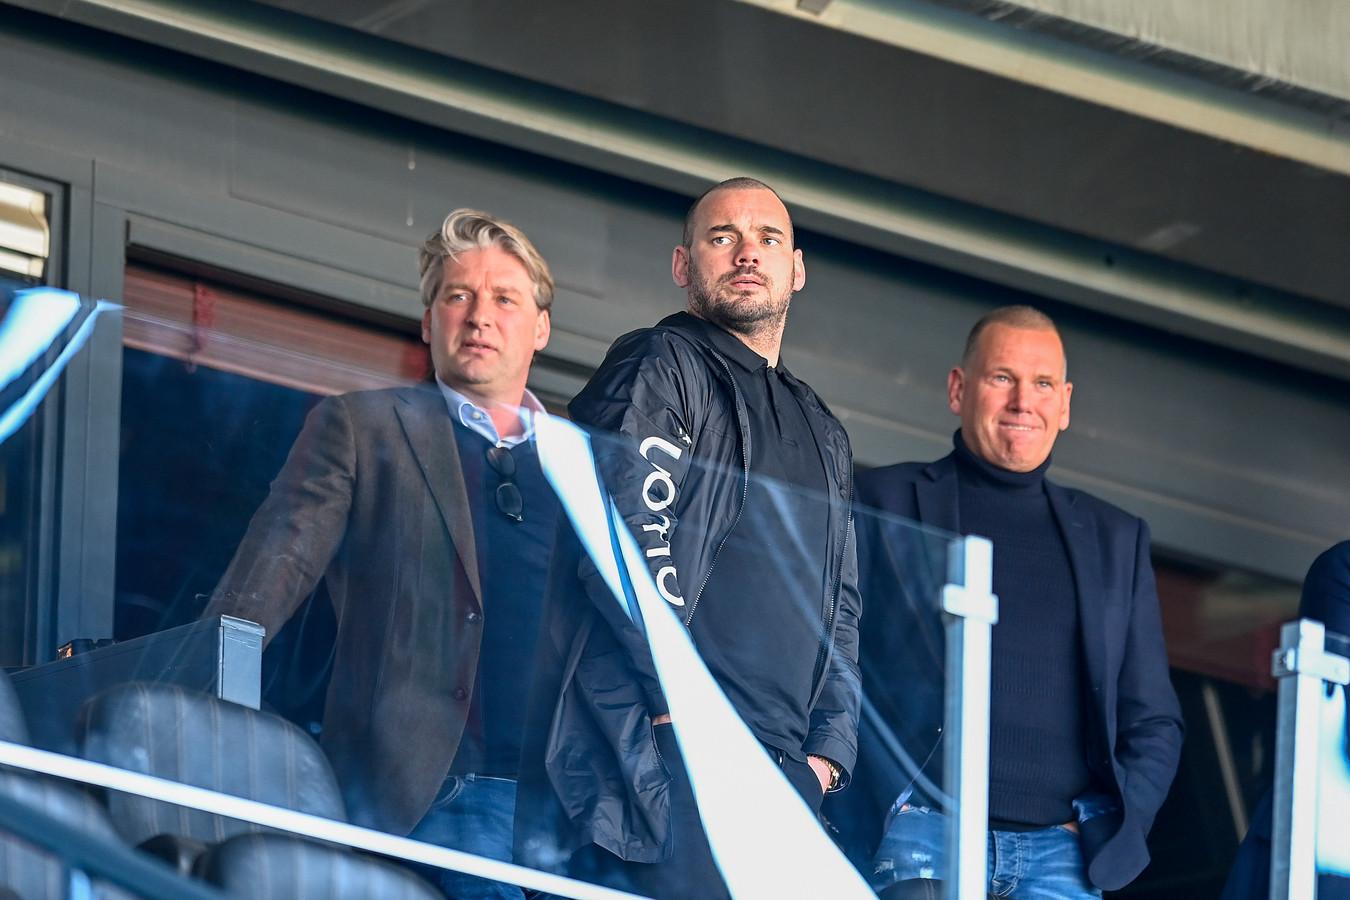 NIJMEGEN, 02-03-2021, Goffertstadion, Dutch Keuken Kampioen Divisie Football, season 2020 / 2021, NEC - Den Bosch,      Wesley Sneijder before the match.